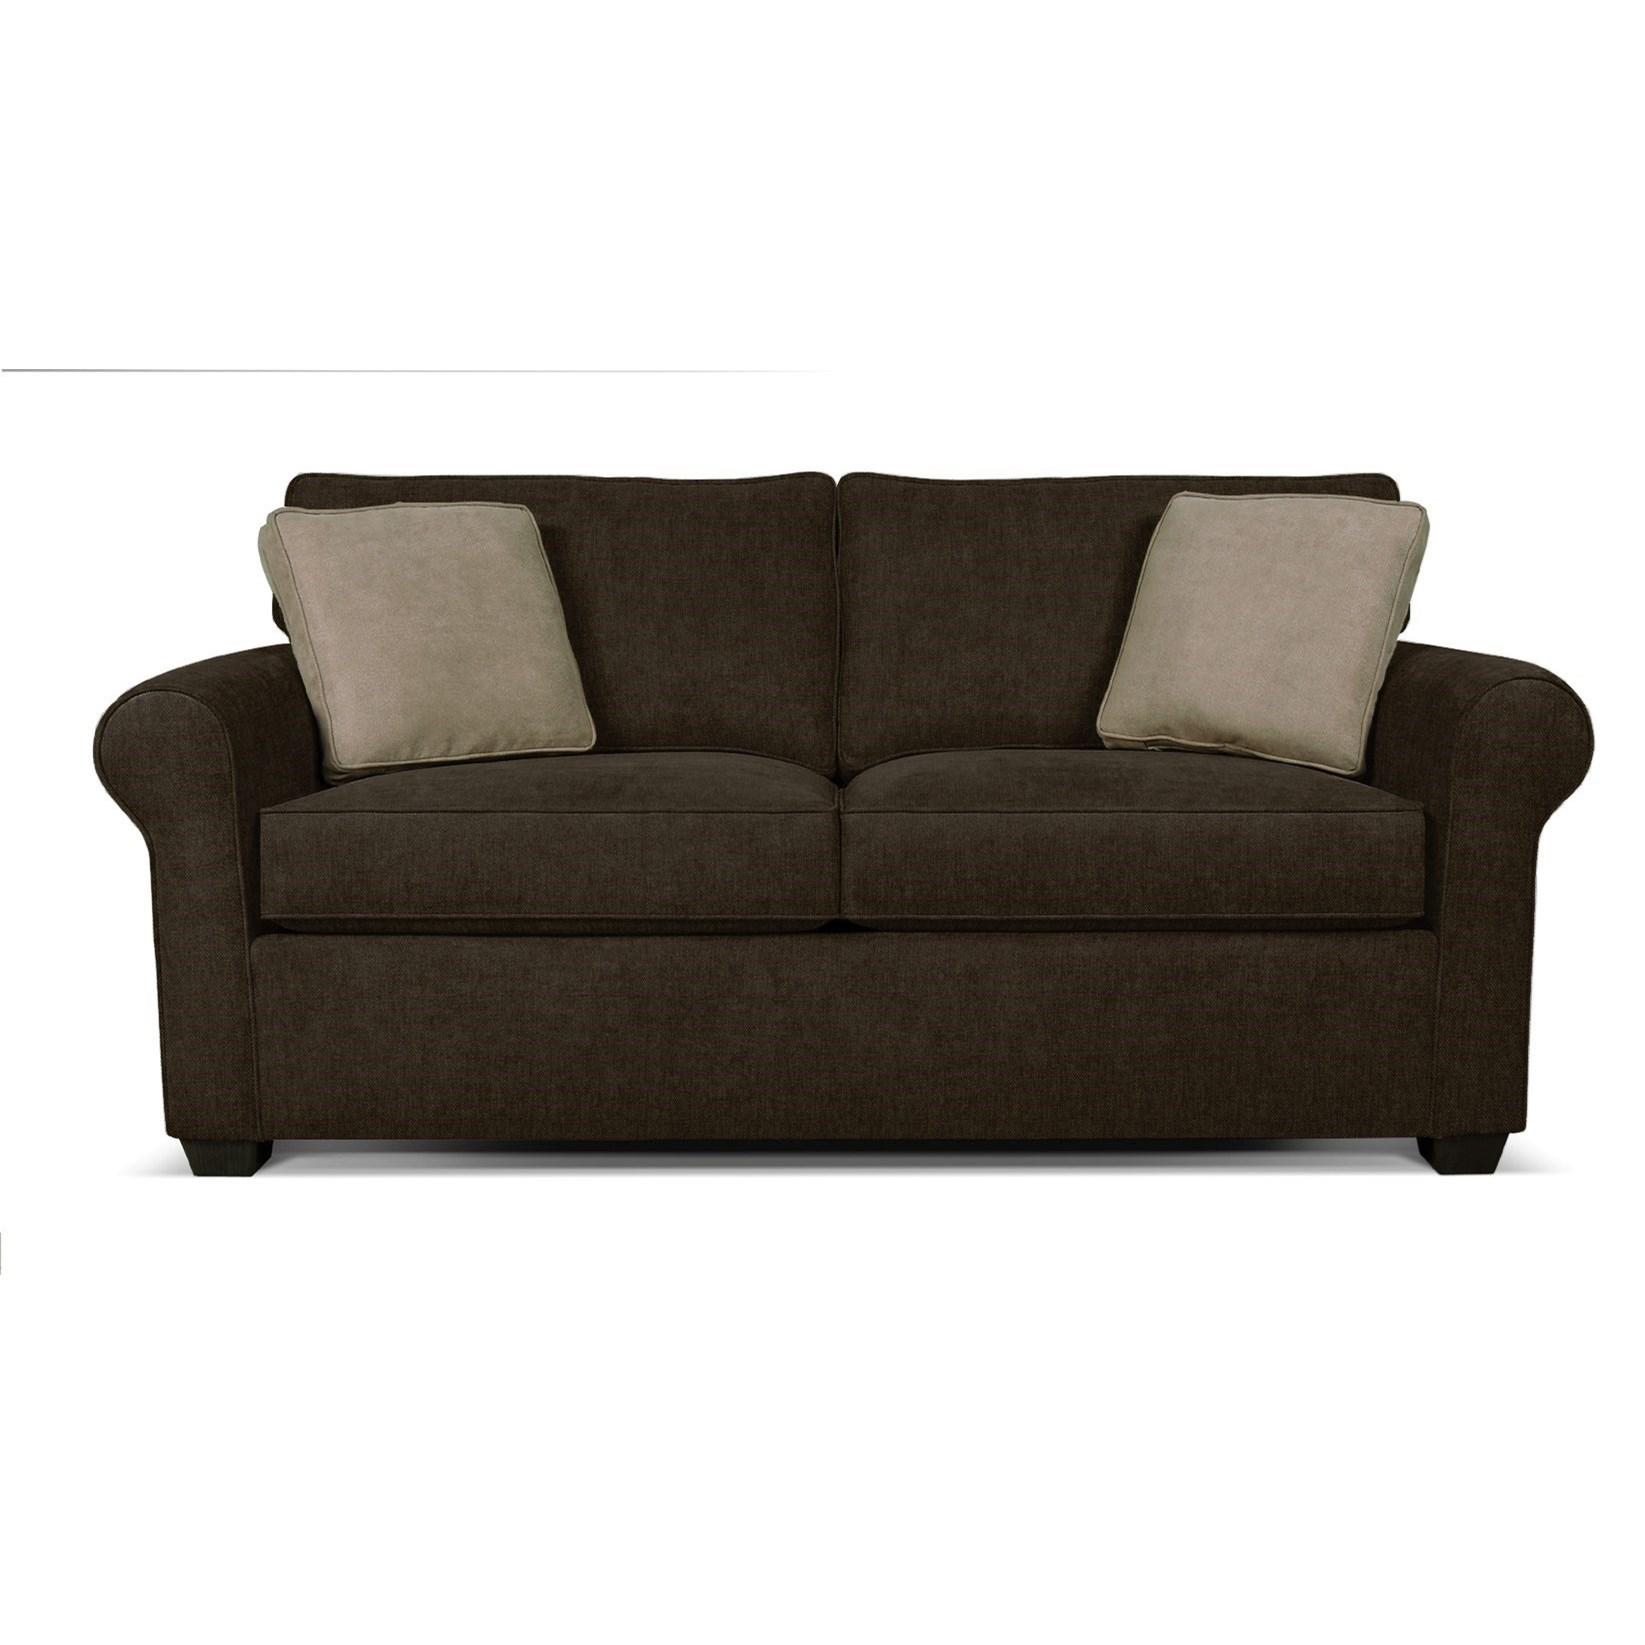 Seabury Full Sleeper Sofa by England at Crowley Furniture & Mattress